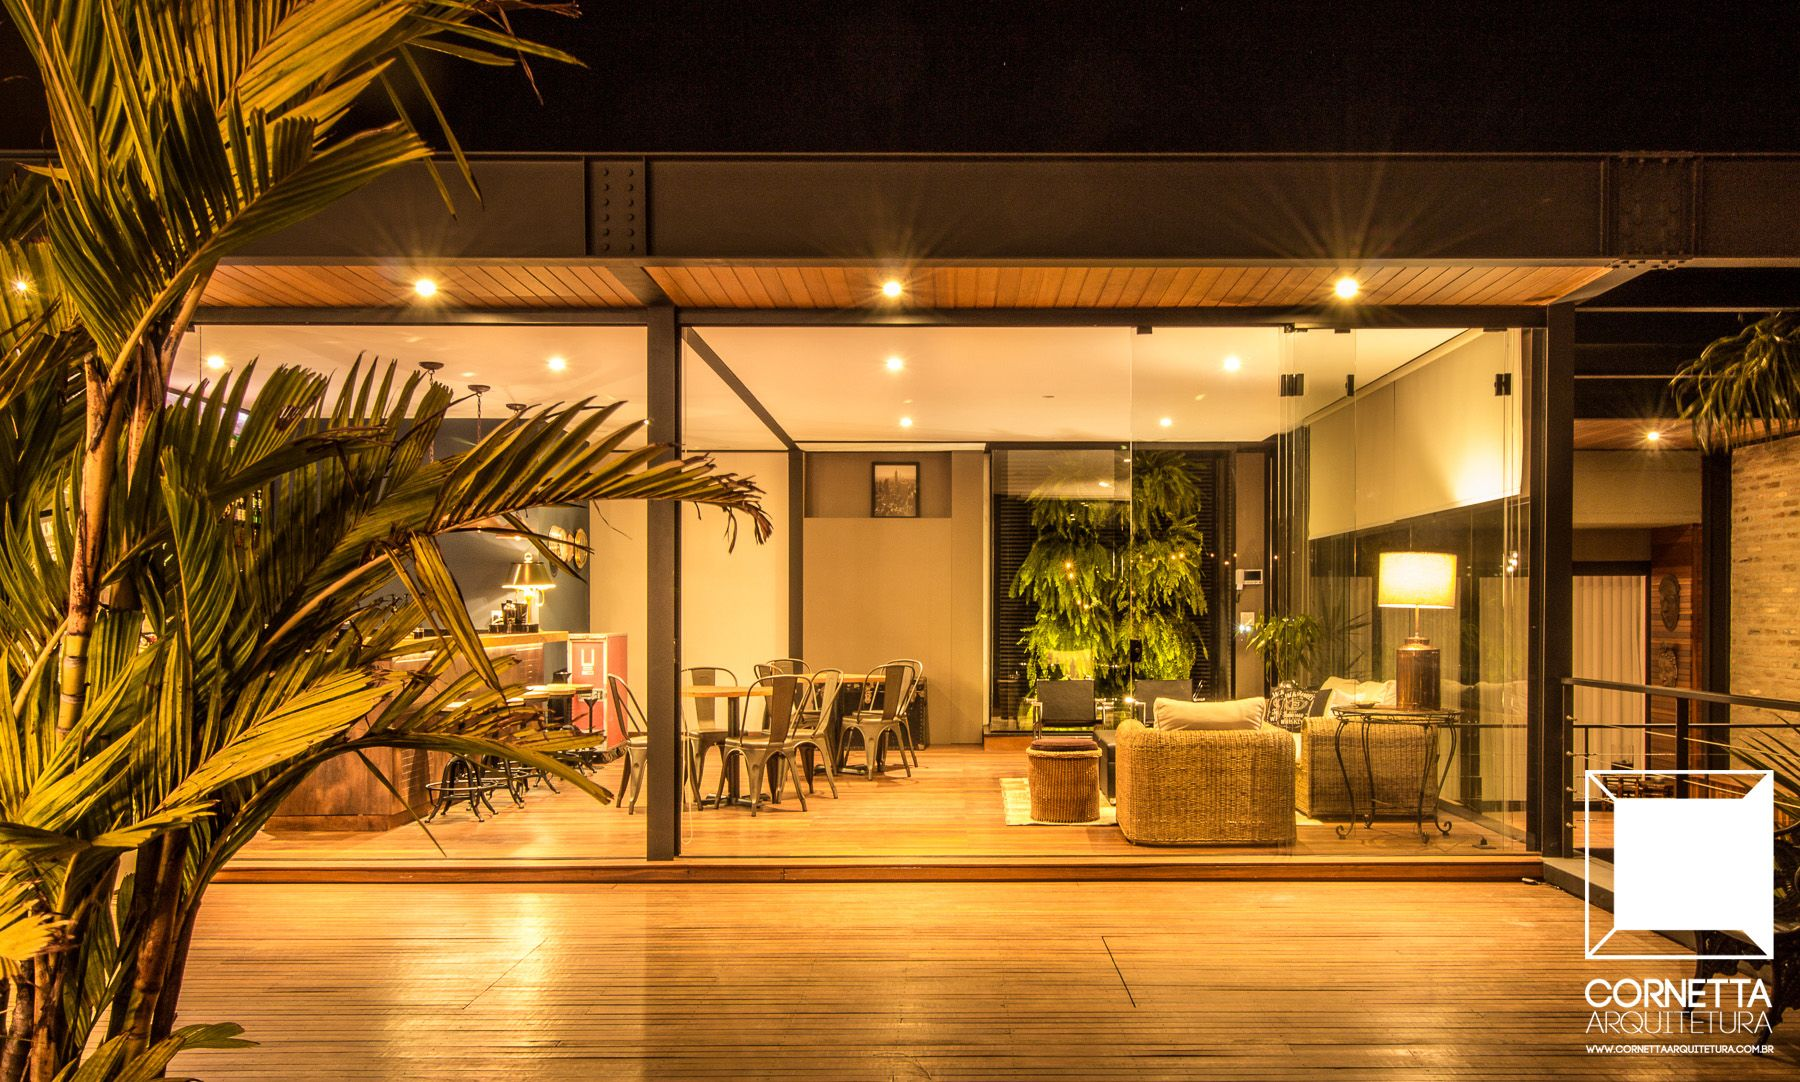 Loft urb estrutura metalica jardim interno e casas modernas for Casas minimalistas vintage